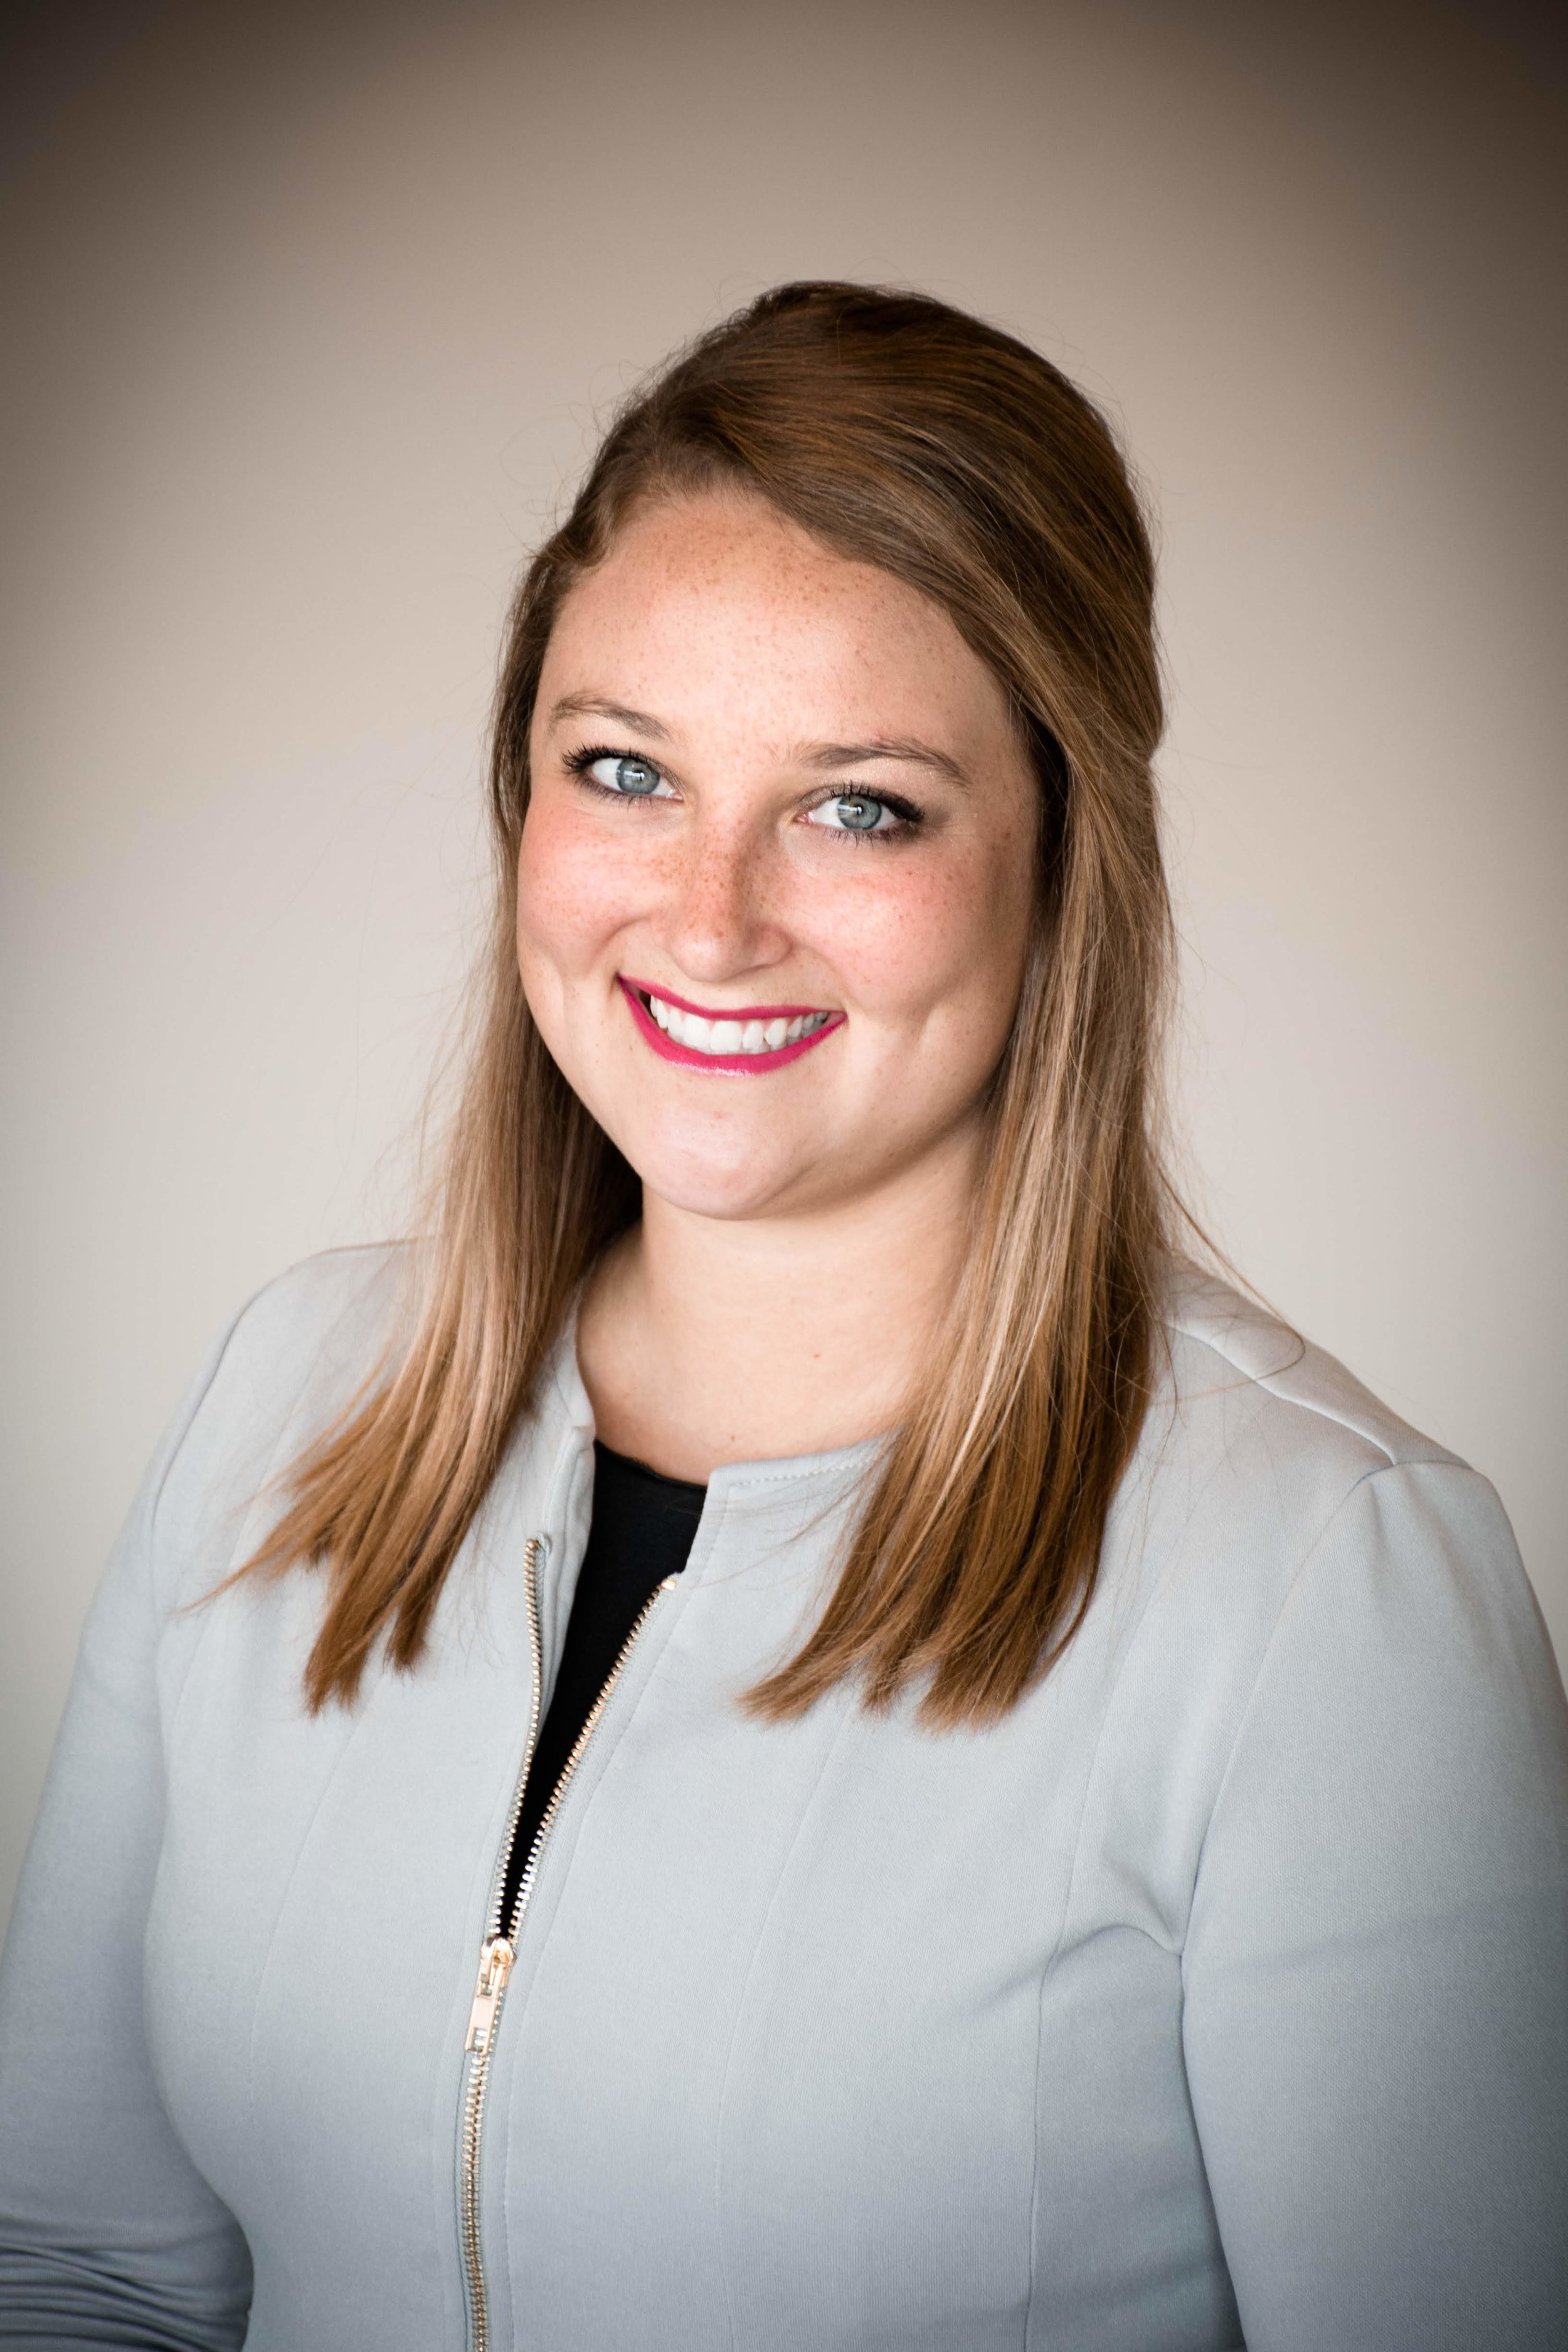 Abby Hoelting - Law Clerk